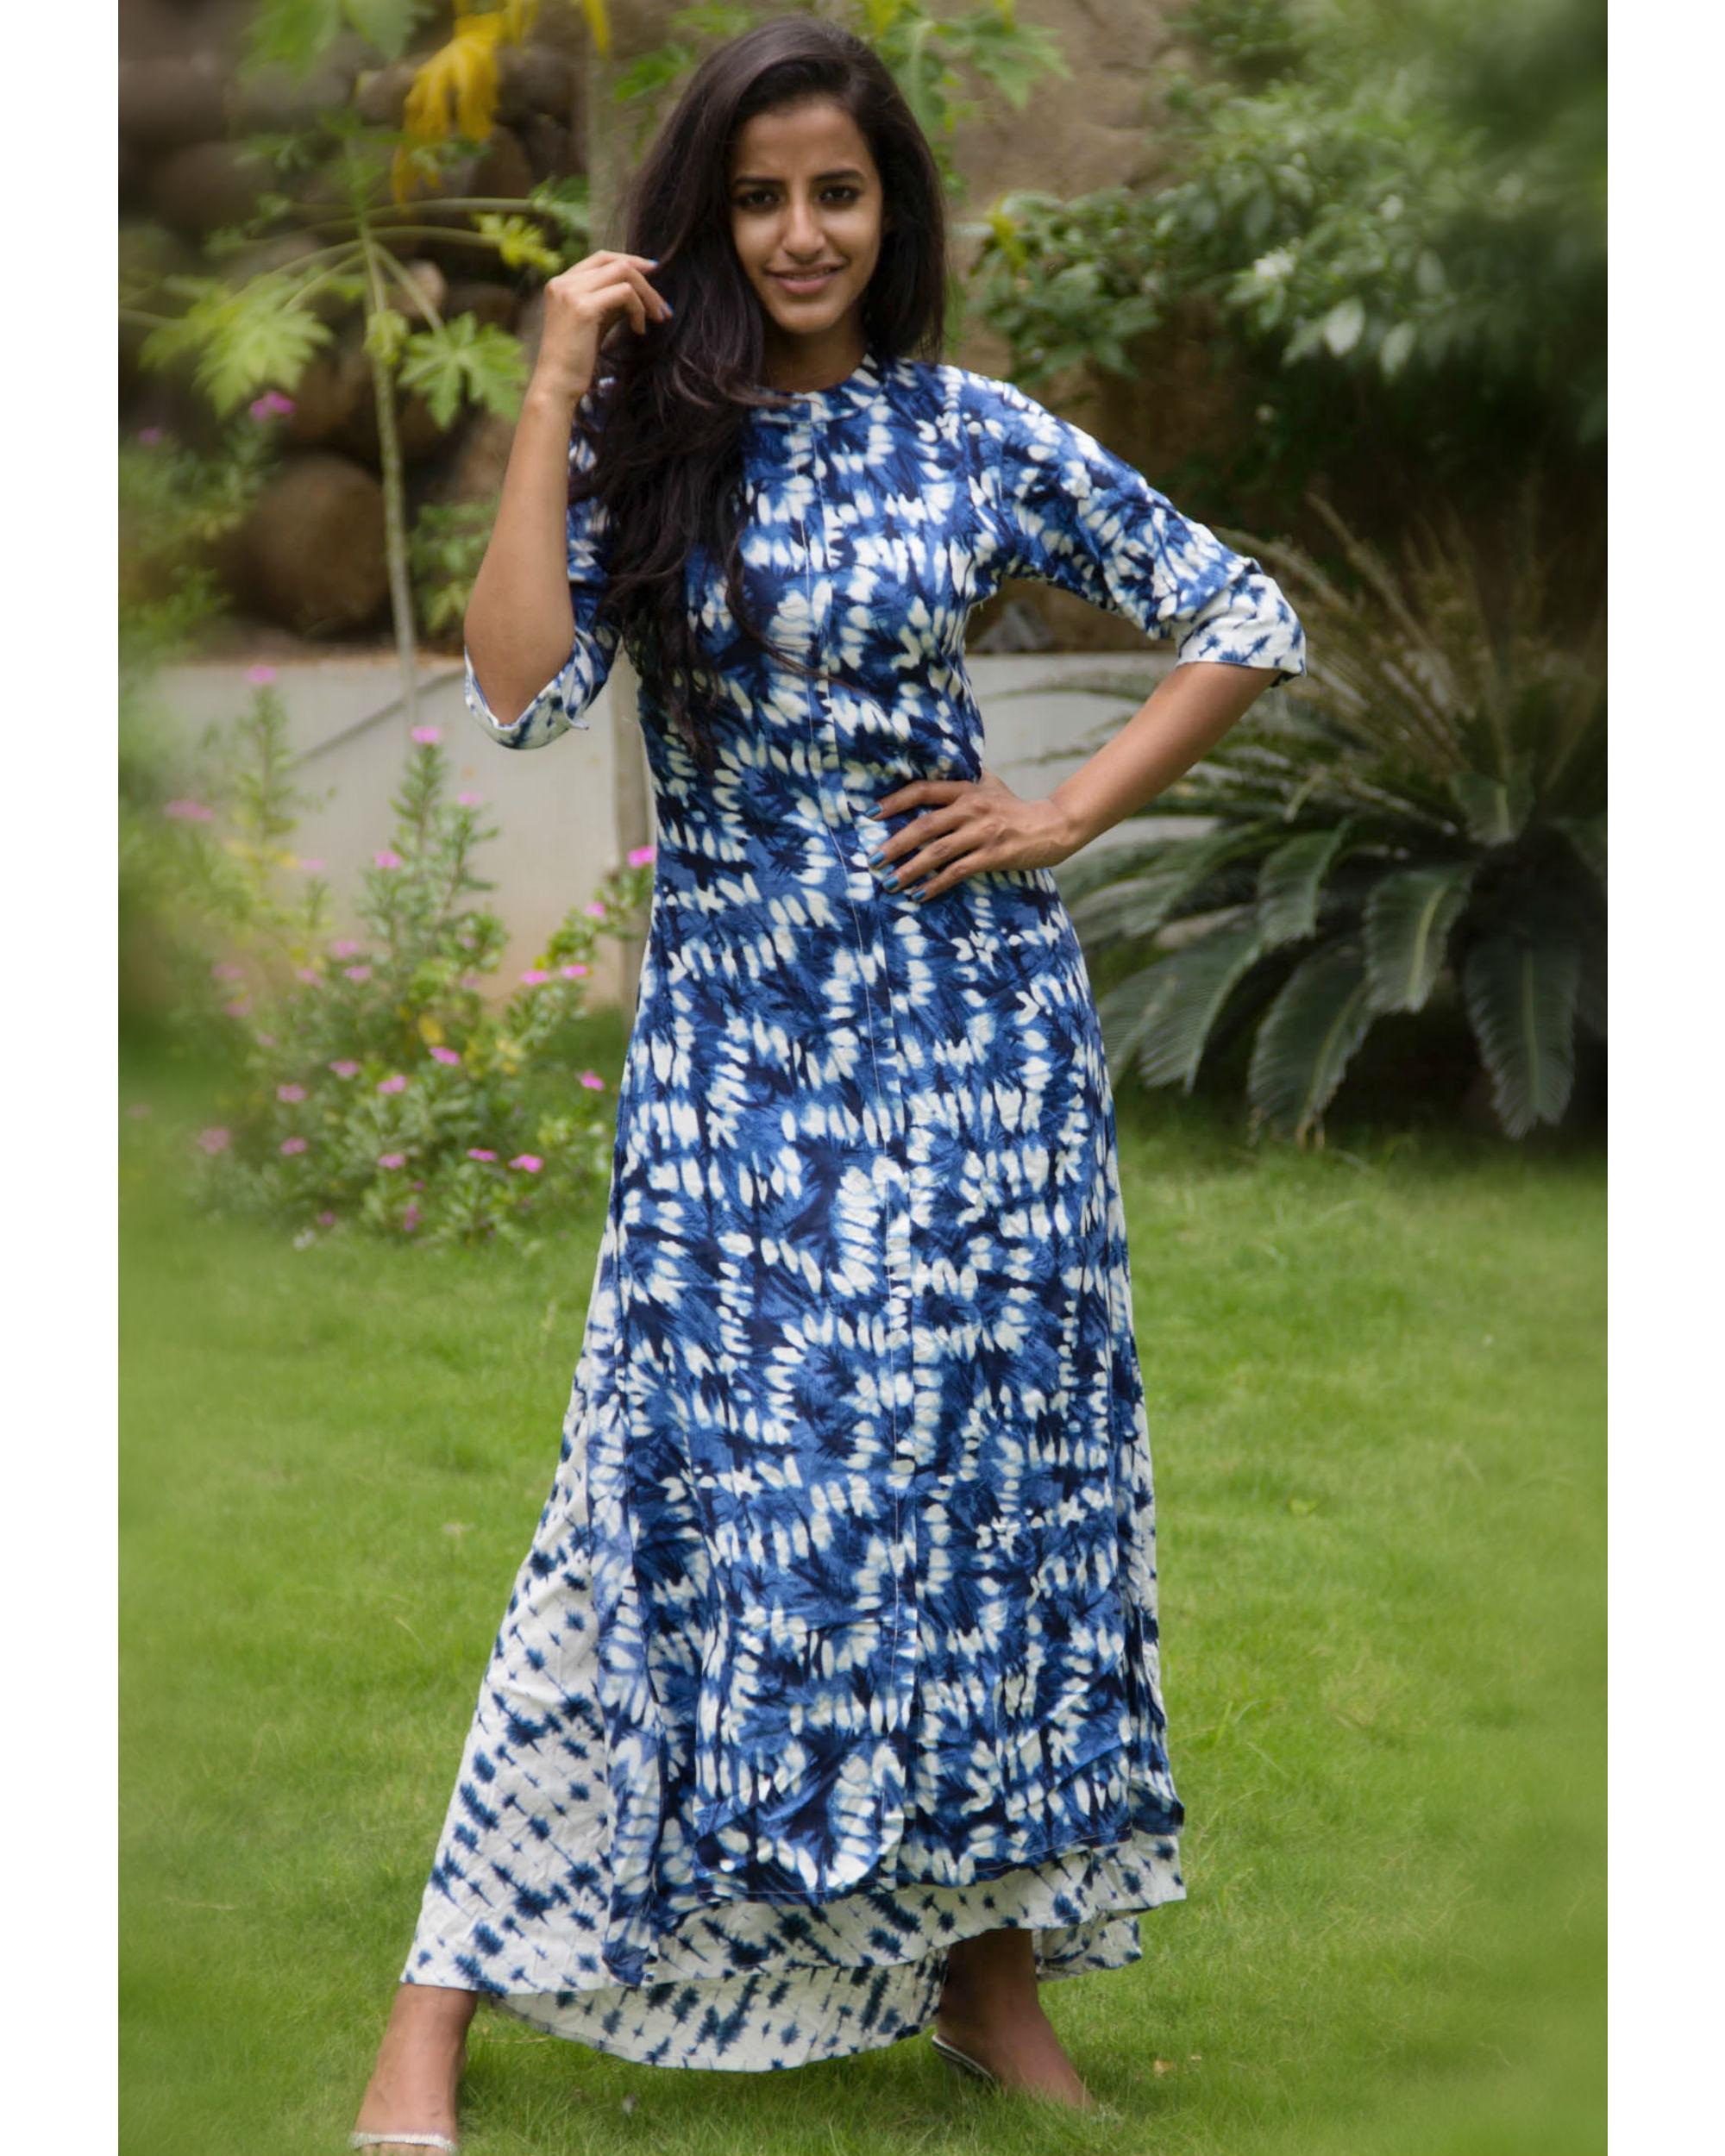 Sapphire and white paneled dress